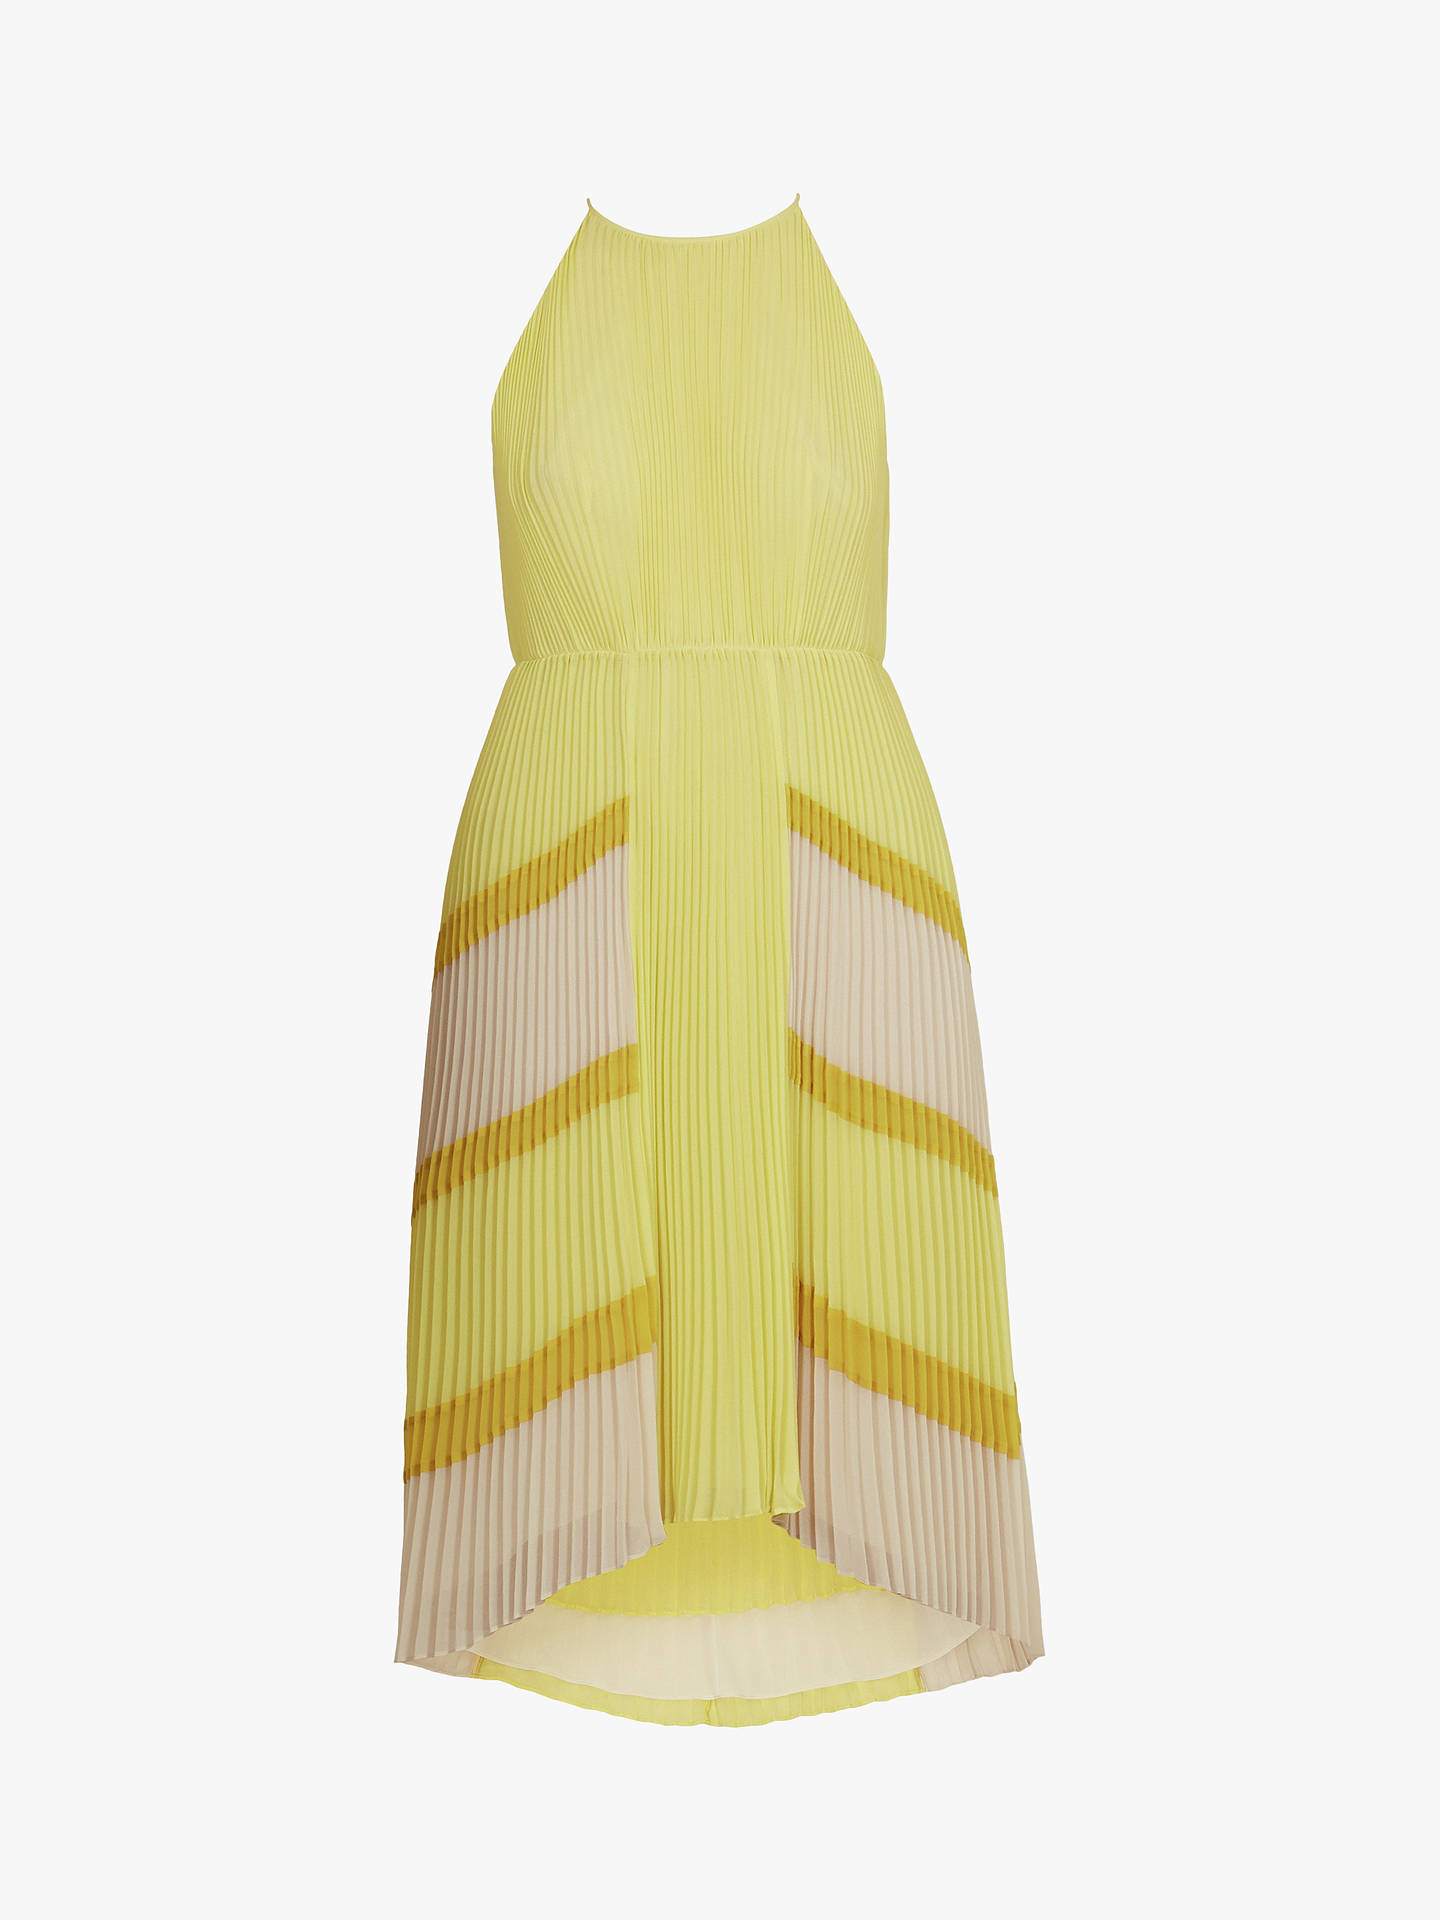 8b824b8496b61 ... Buy Ted Baker Nellina Pleated Dress